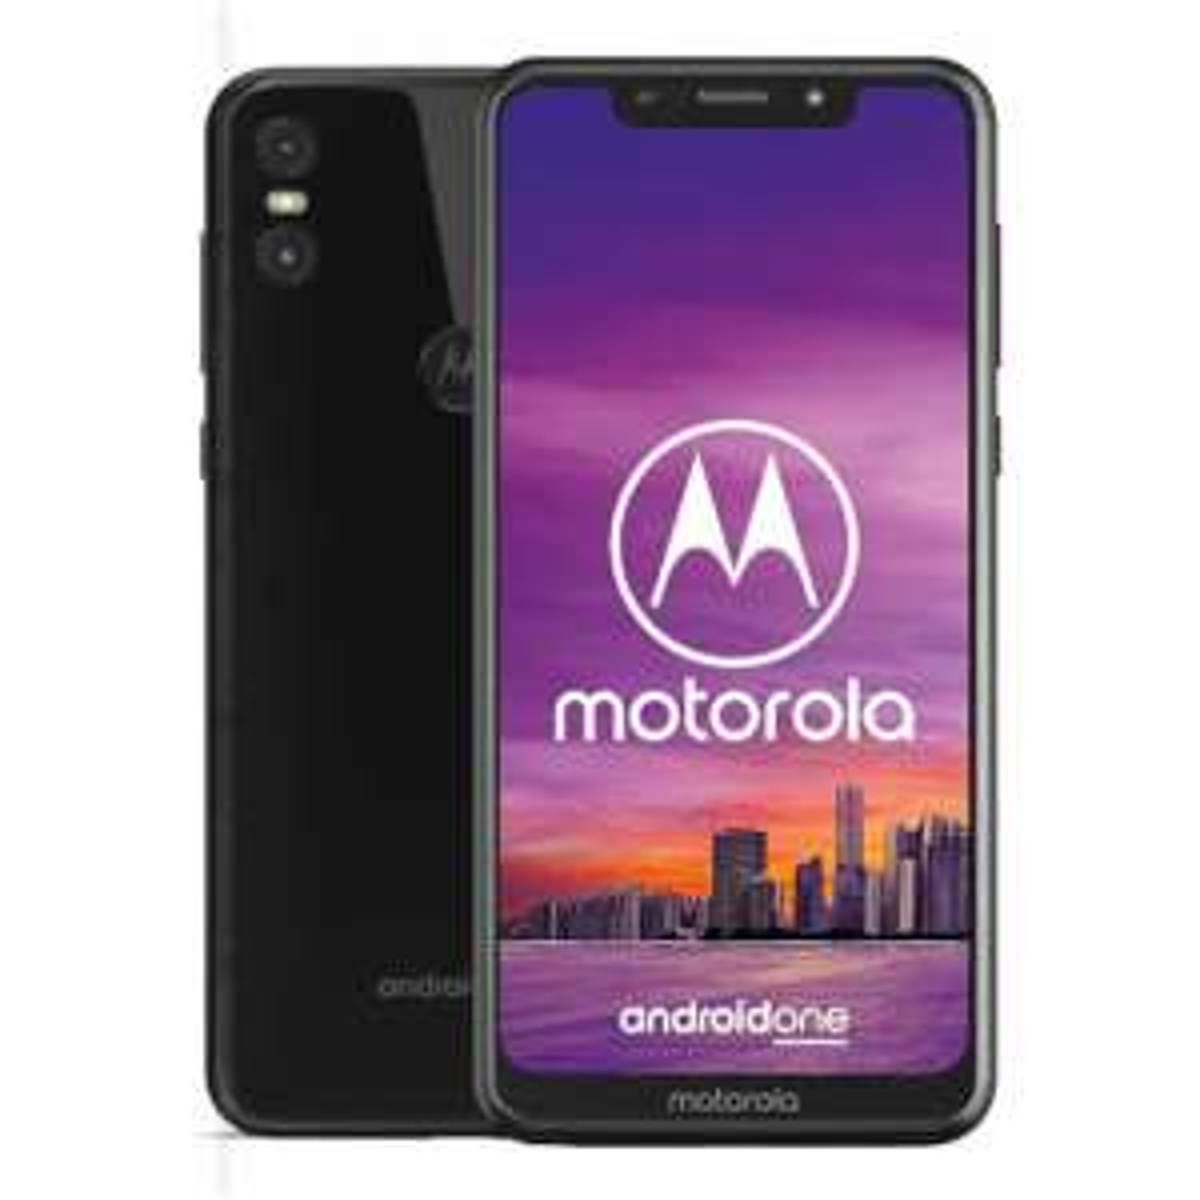 "Motorola One Dual SIM Smartphone, Android, 5.9"", 4G LTE, SIM Free, 64GB, £170 at John Lewis & Partners instore (Welwyn)"